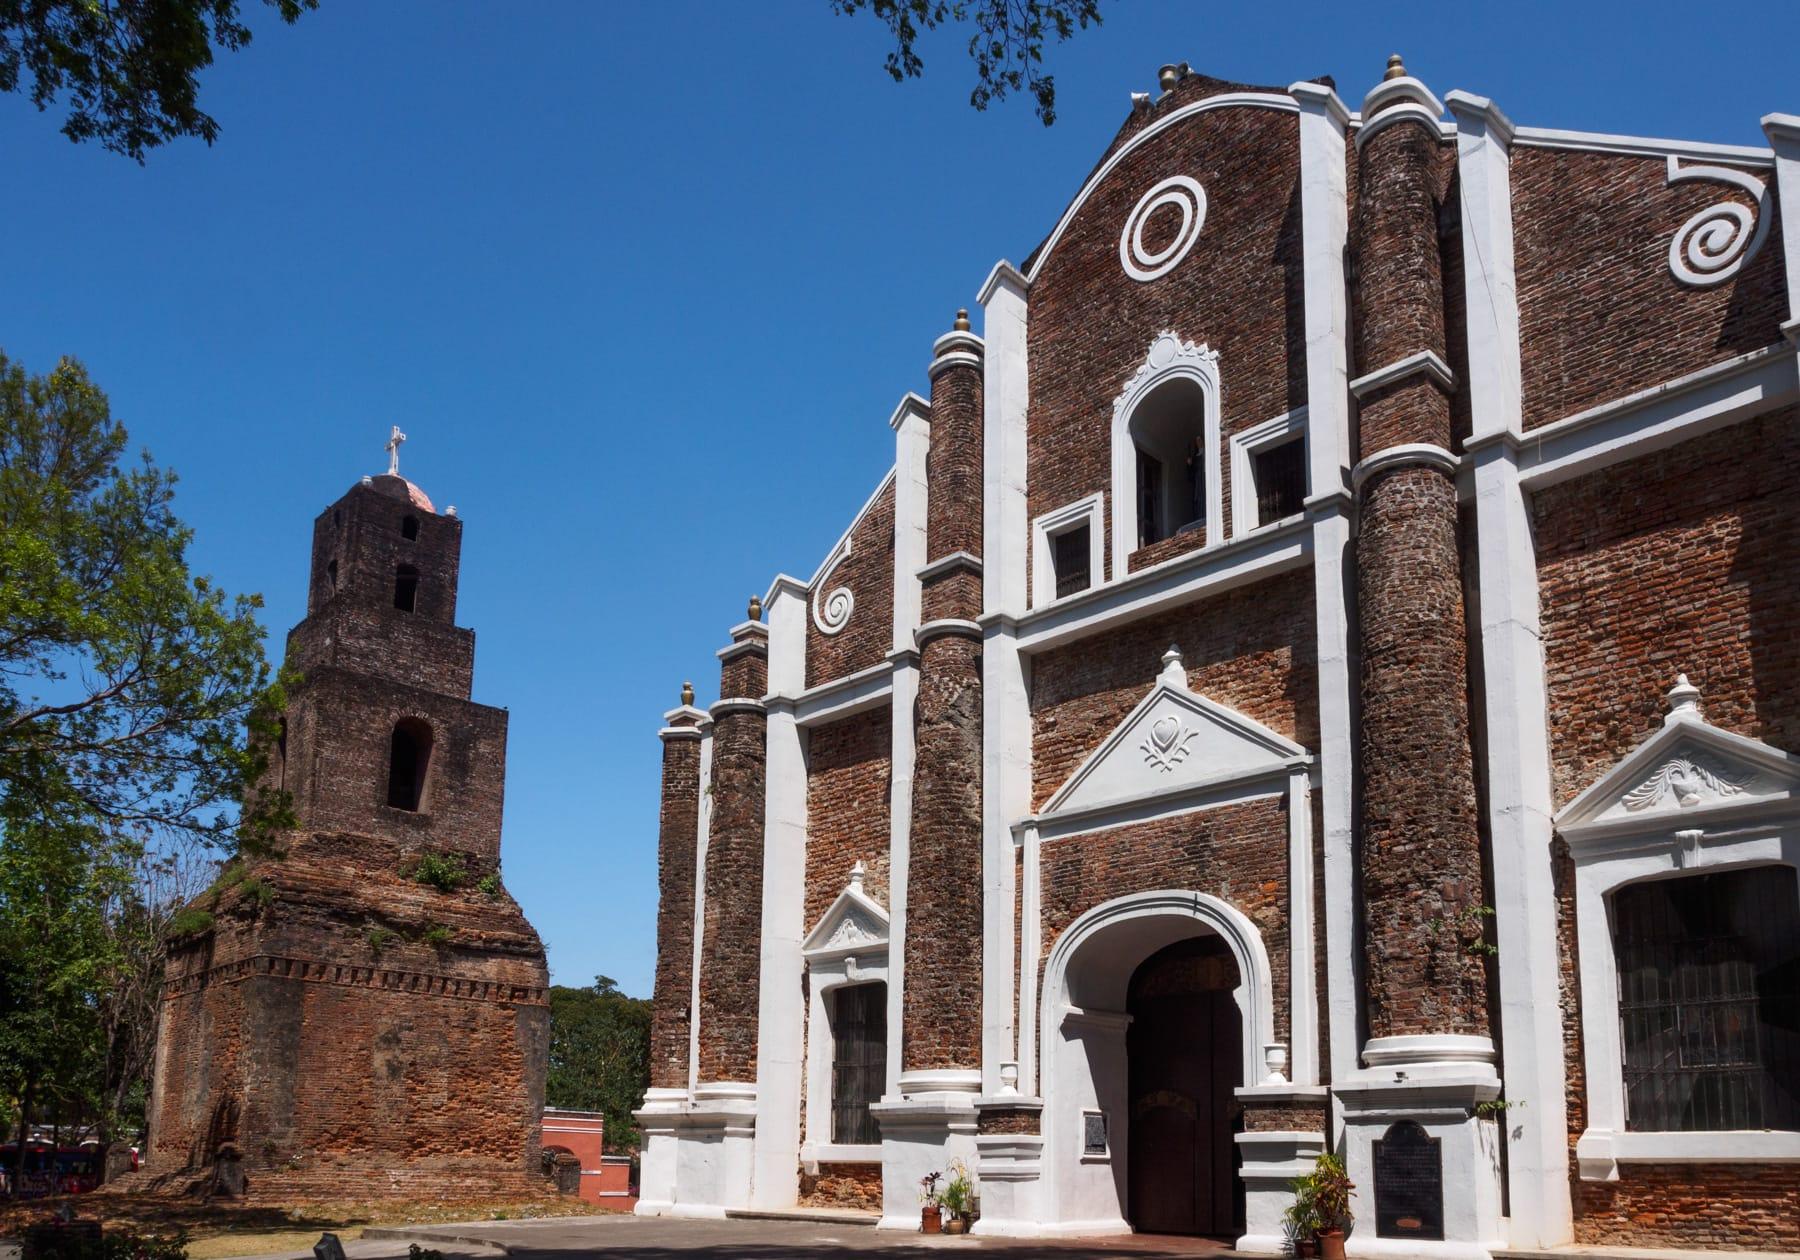 Ilocos Norte Tourist spots, Santa Monica Church, things to do in Laoag, tourist spots in Ilocos Norte